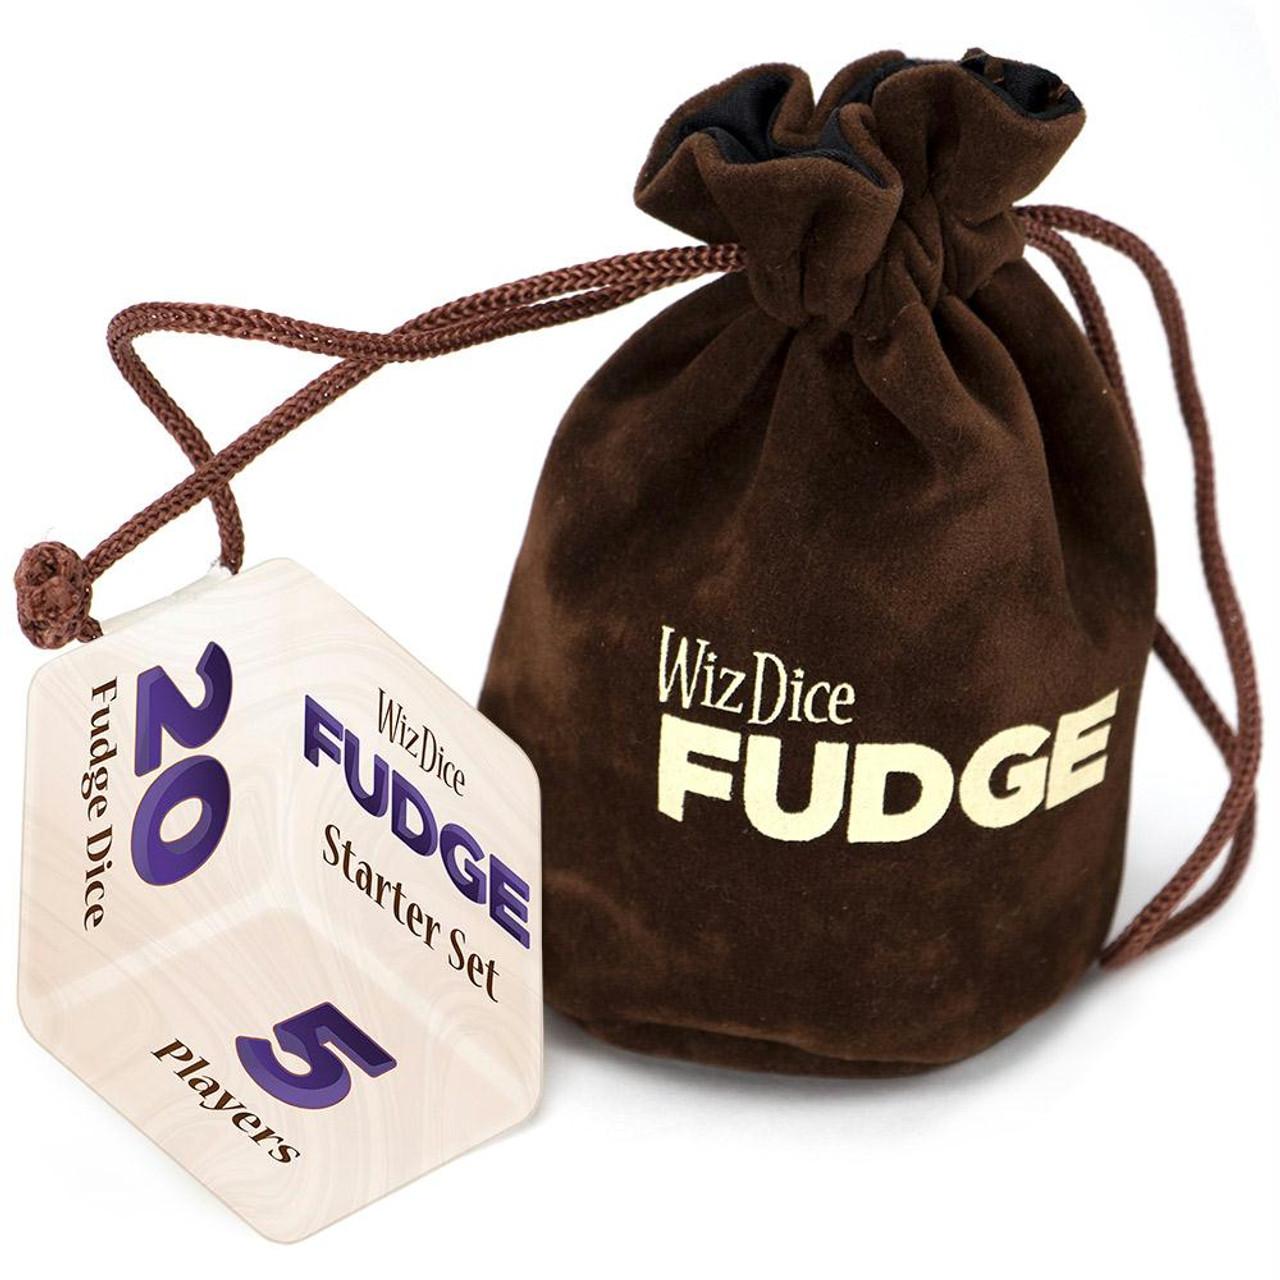 New Wiz Dice 4 Piece Fudge Dice Set Lucid Dreams With Dice Bag RPG 4DF